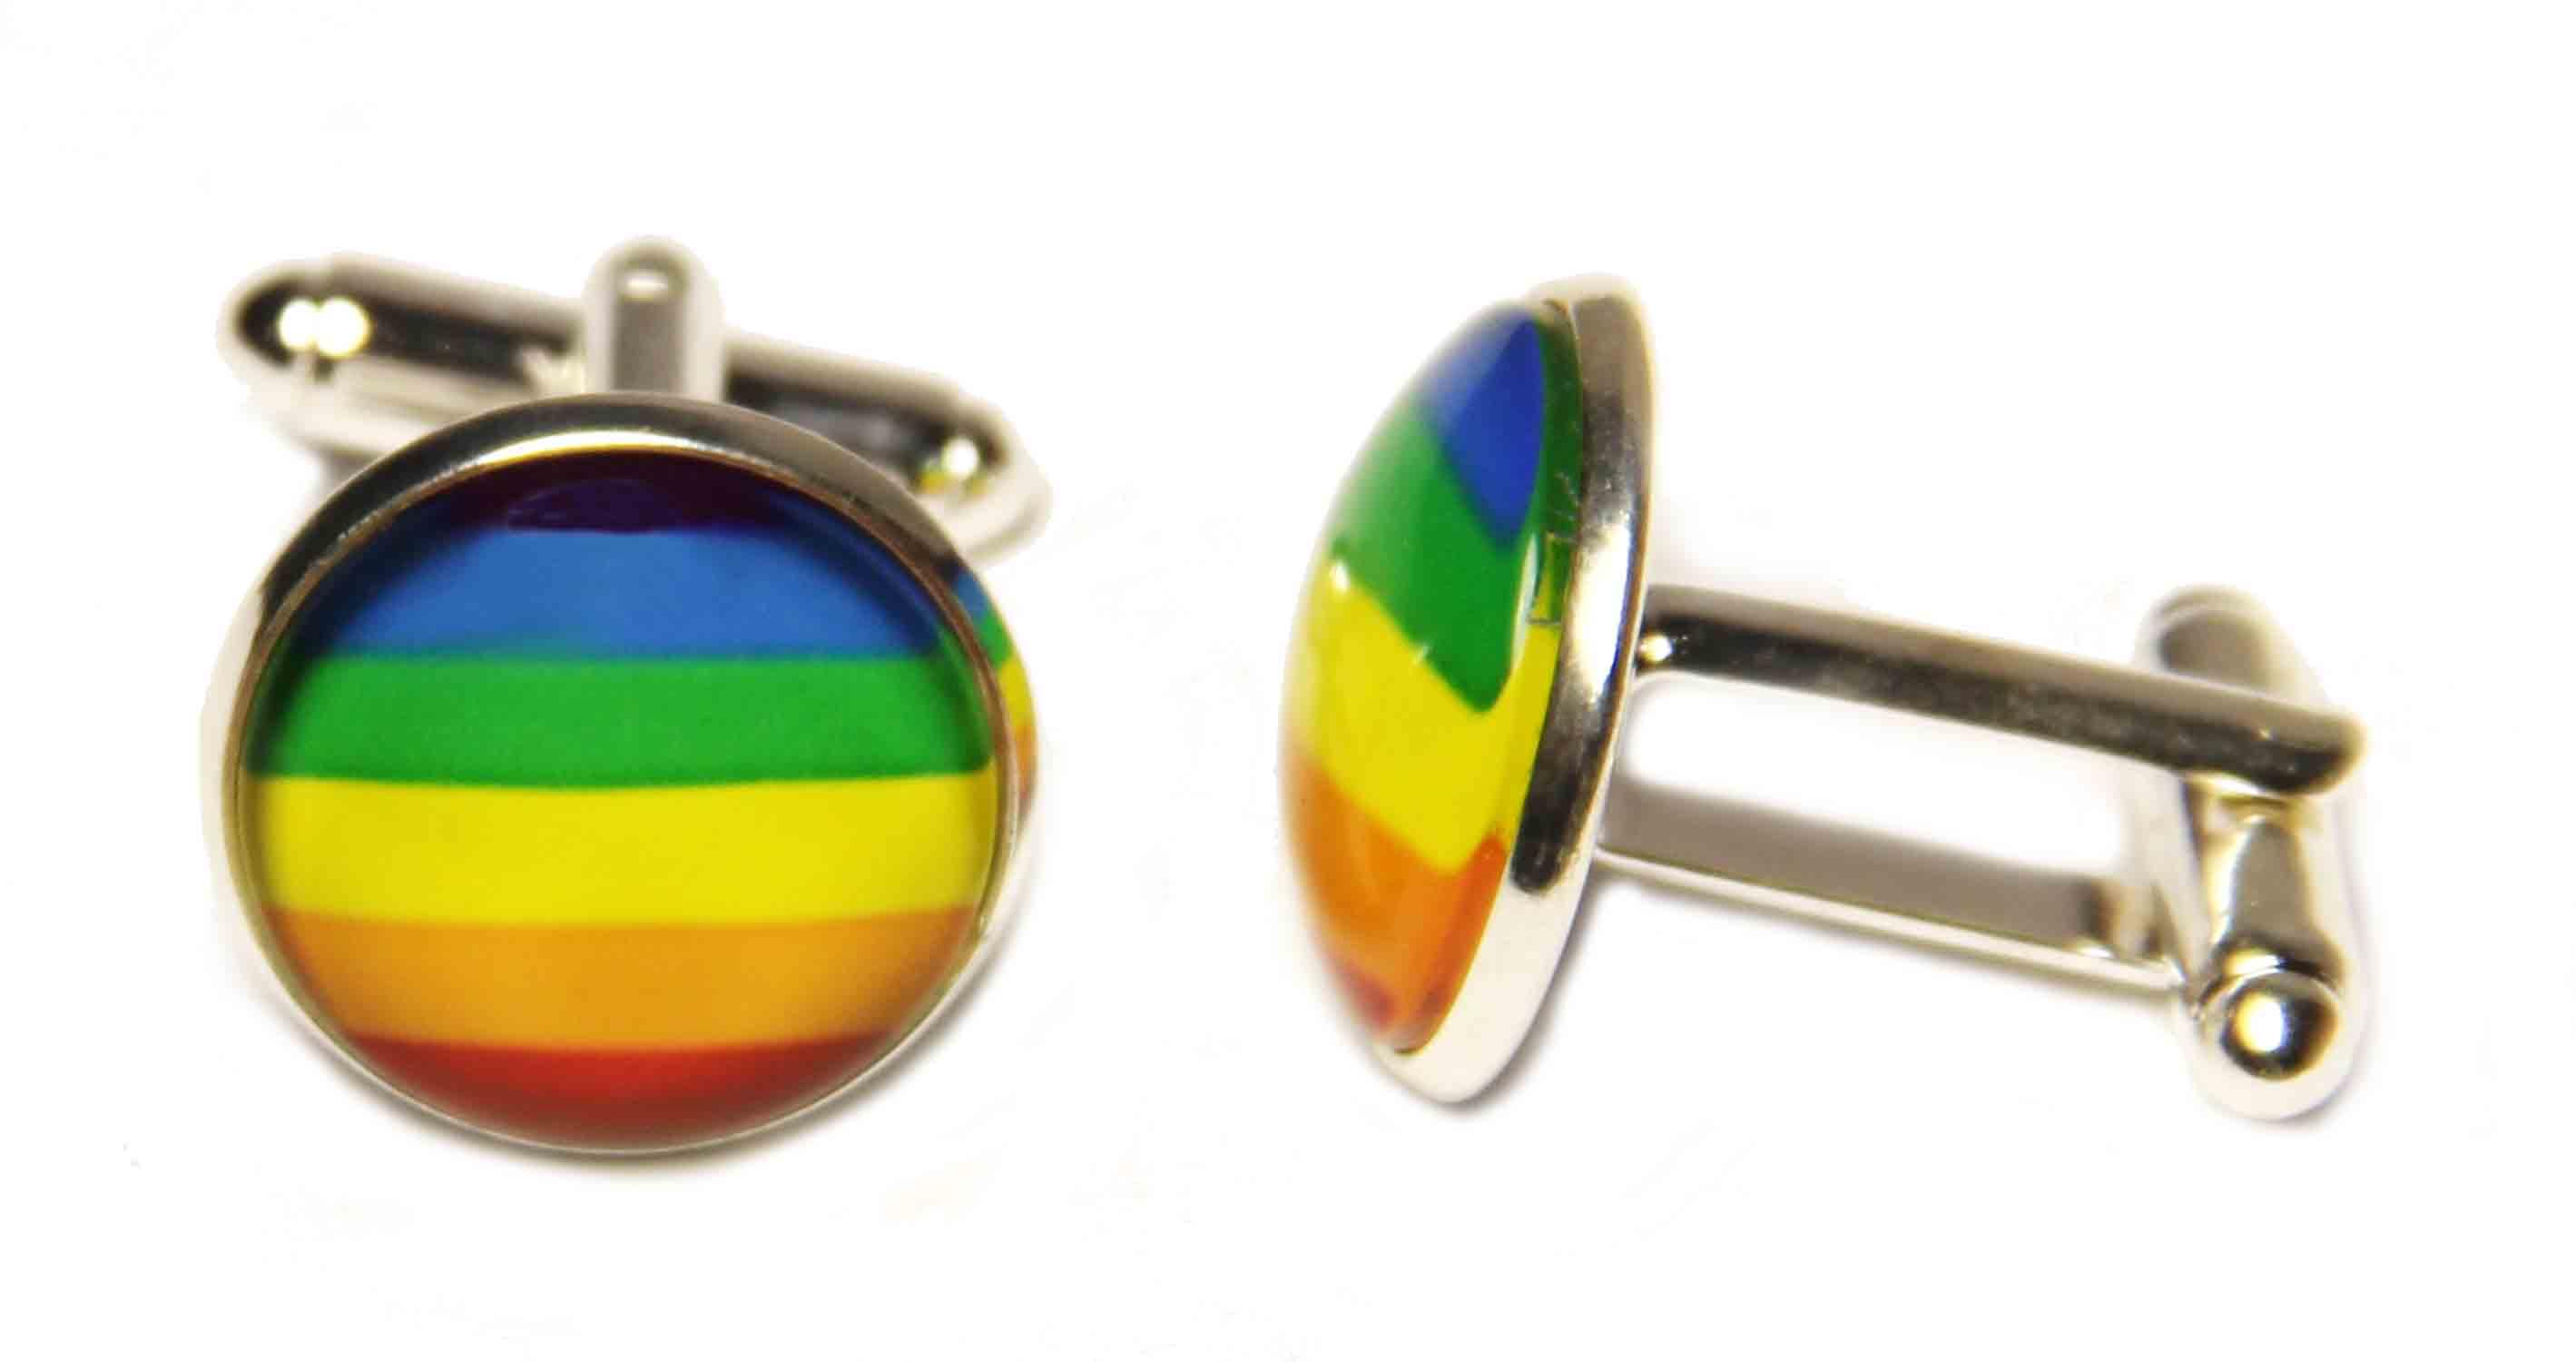 Rainbow Flag Cufflinks Silver Metal Alloy LGBT Gay Pride Men's